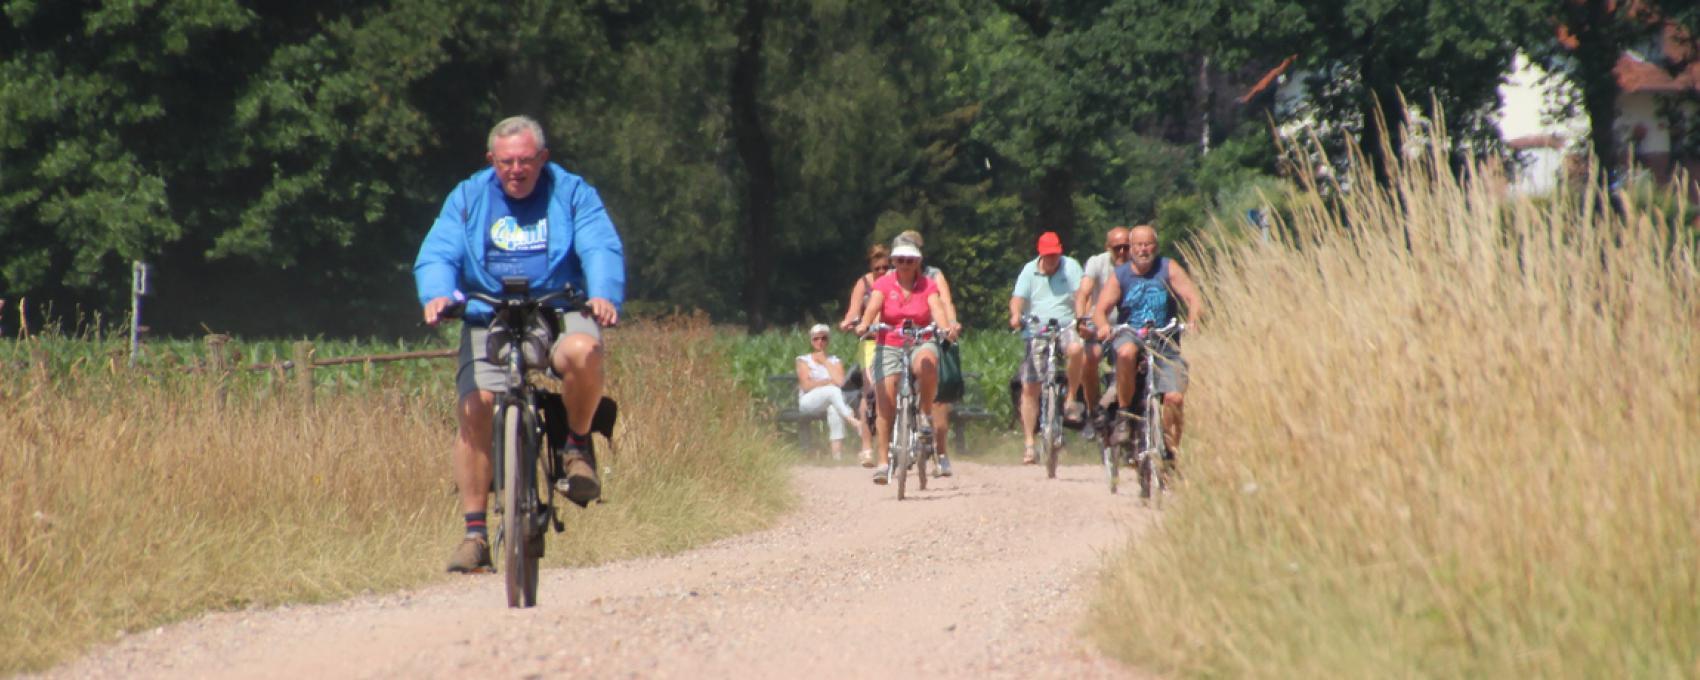 Fahrradfahren Winterswijk